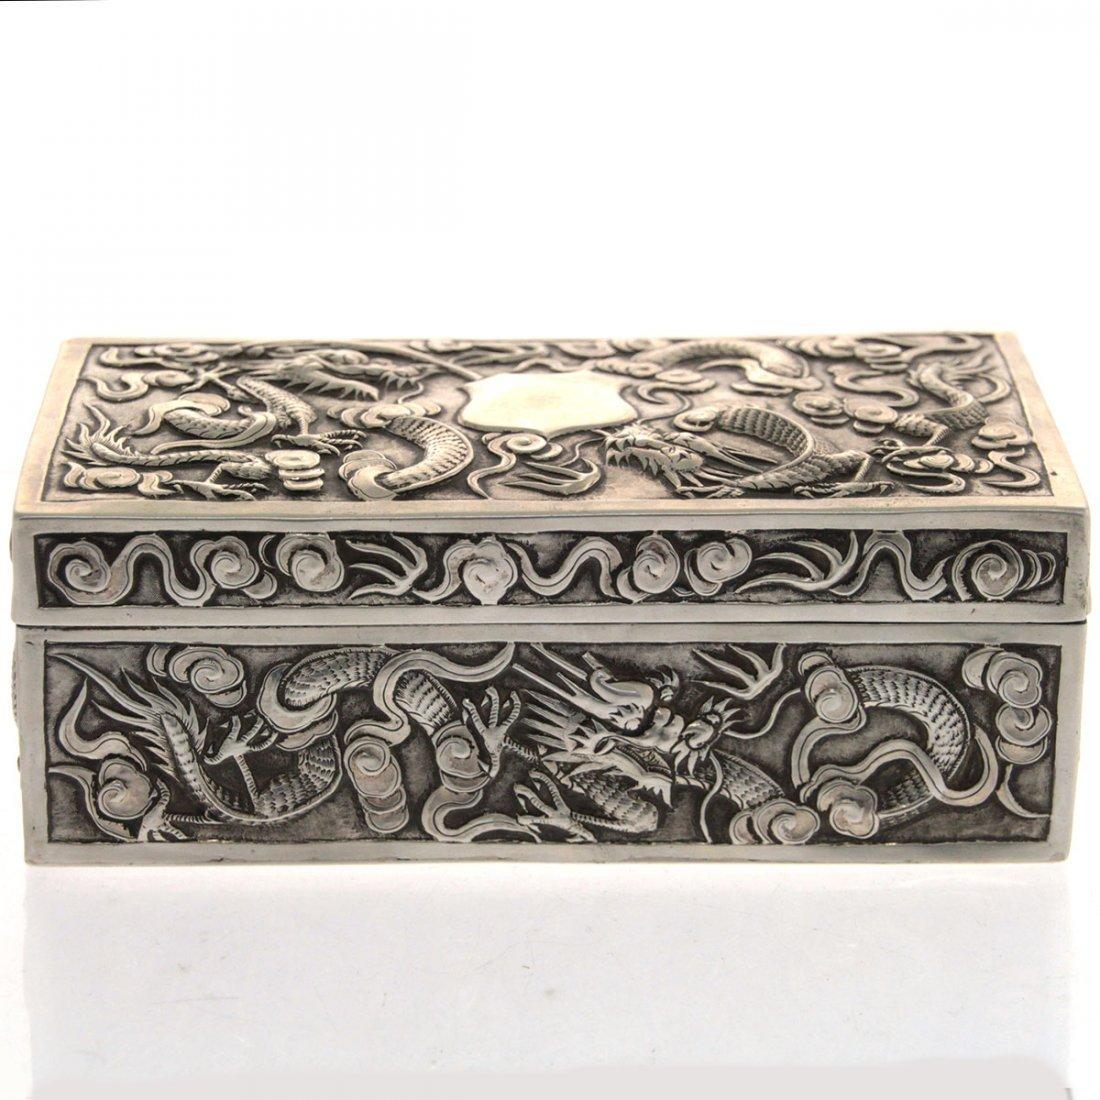 Chinese Export Silver Box By Kwong Wa Circa 1870